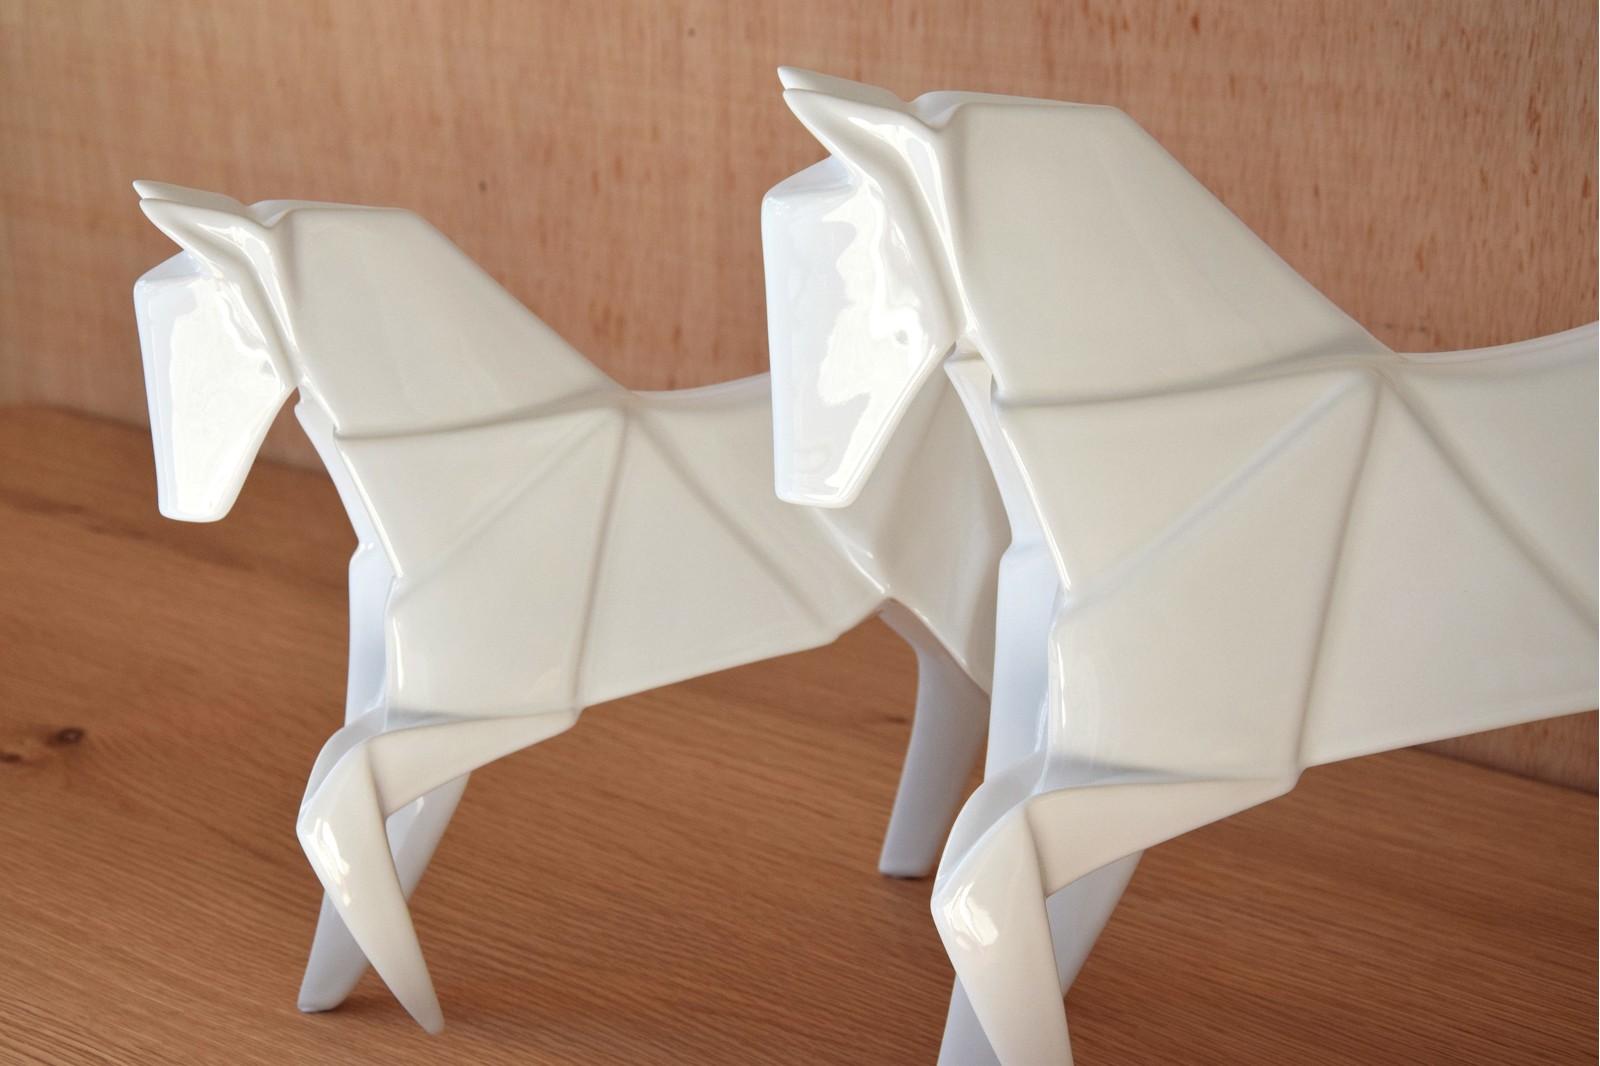 ORIGAMI HORSE COLLECTION. WHITE CERAMIC SCULPTURE